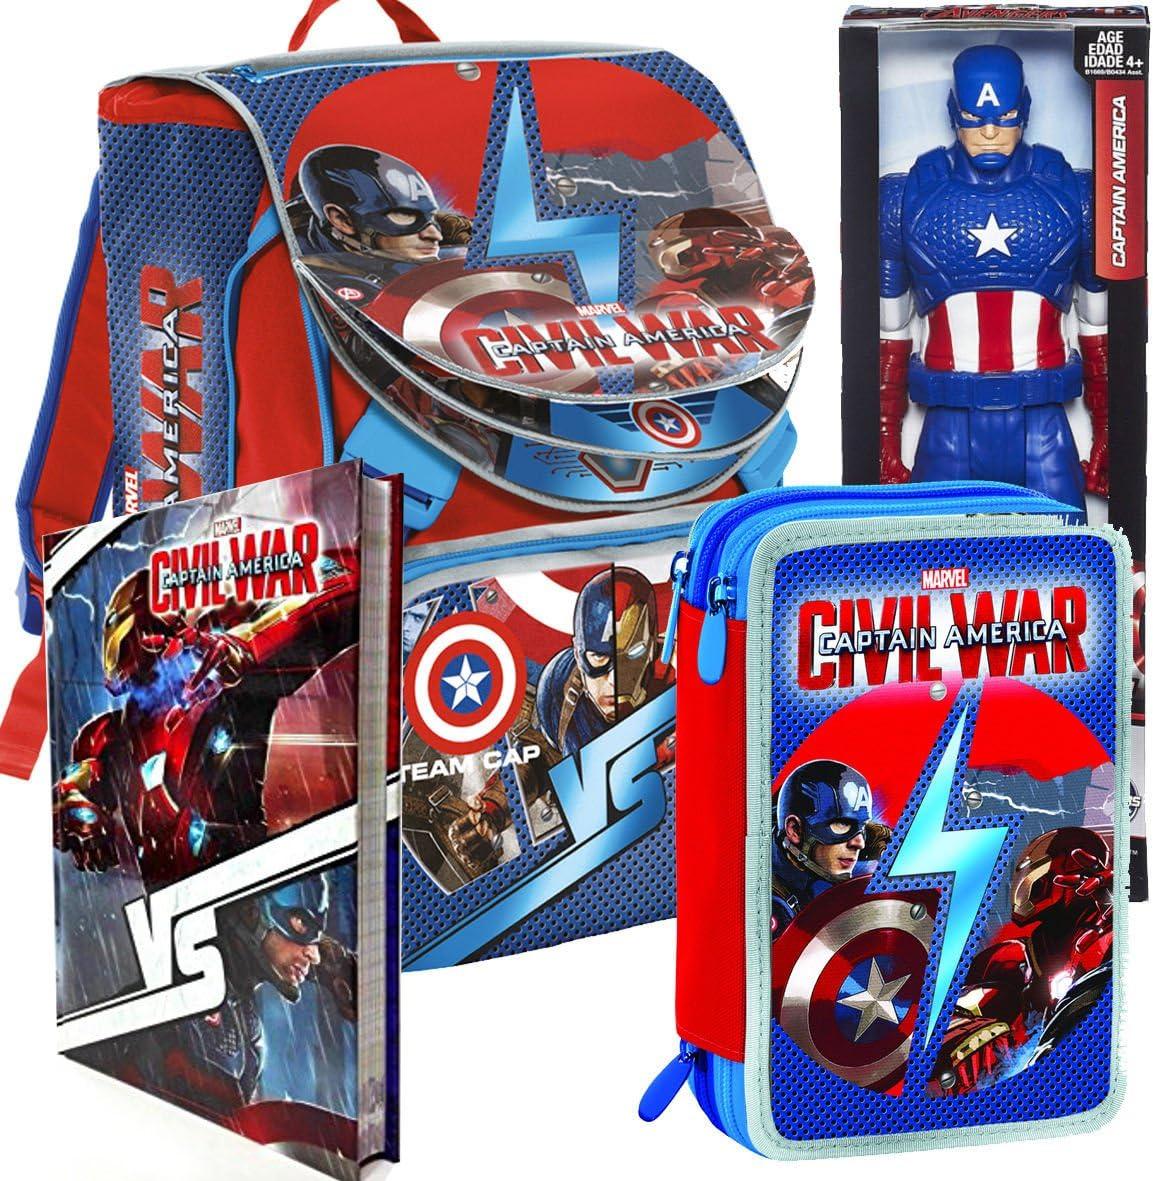 Mochila School Pack Capitán América Civil War 2016/17 (Mochila + ...